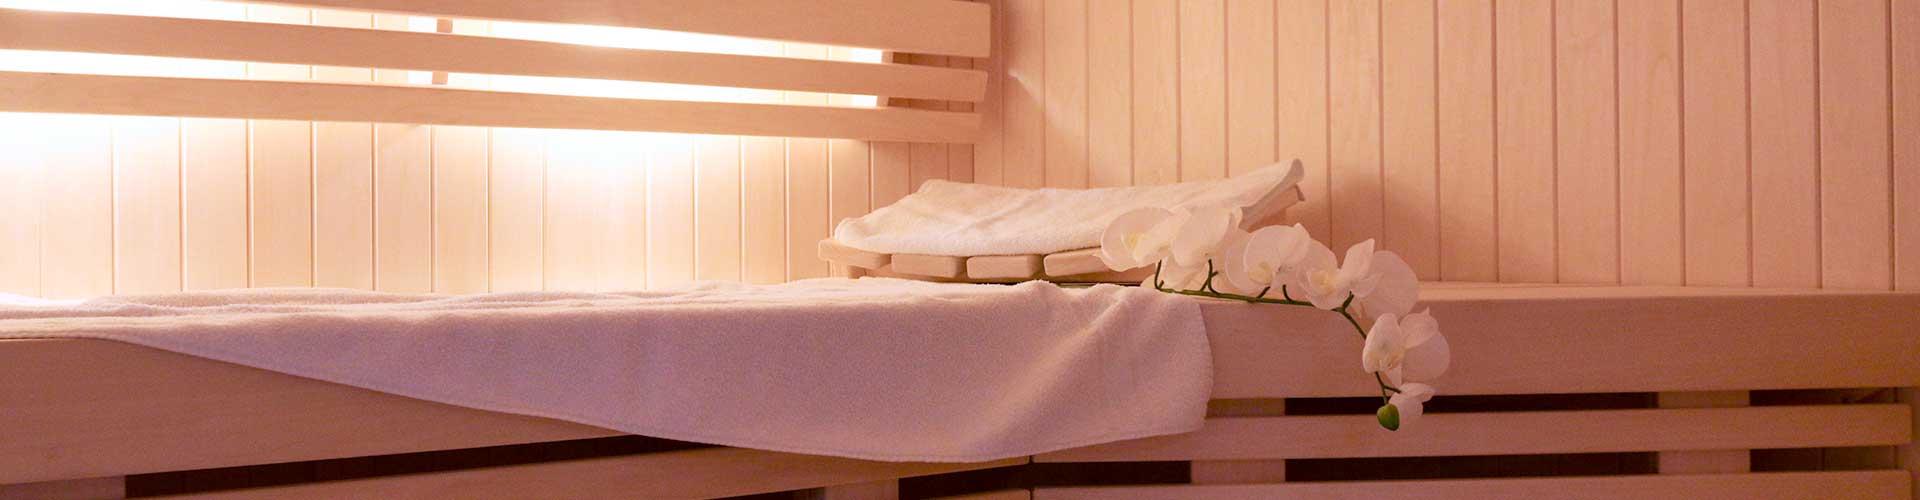 Hotel Rössle Berneck: Unsere Wellness-Oase